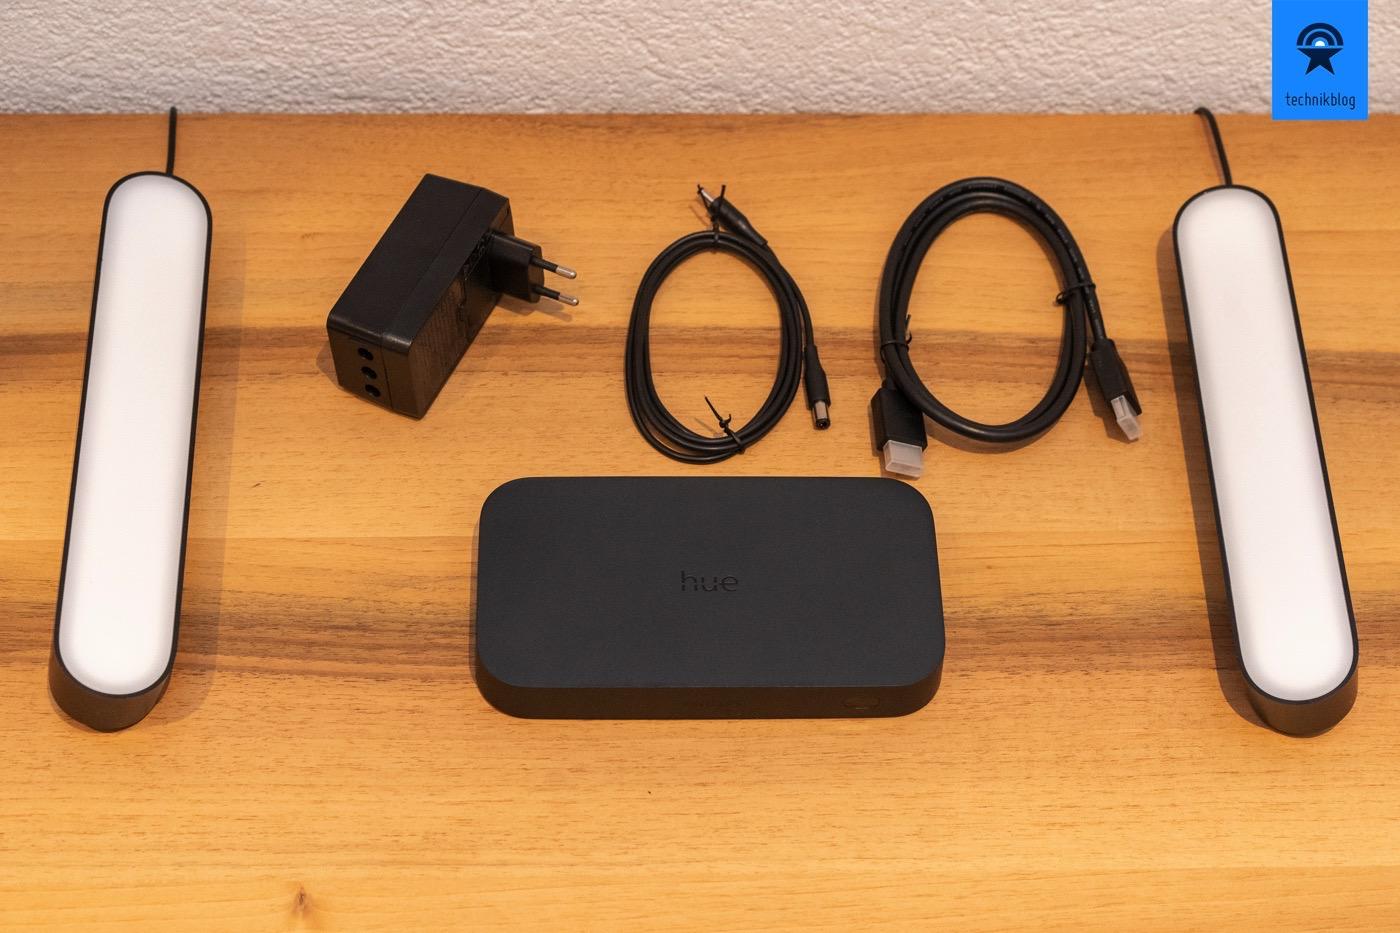 Philips Hue Play HDMI Sync Box: Lieferumfang der Box, Hue Play ist separat